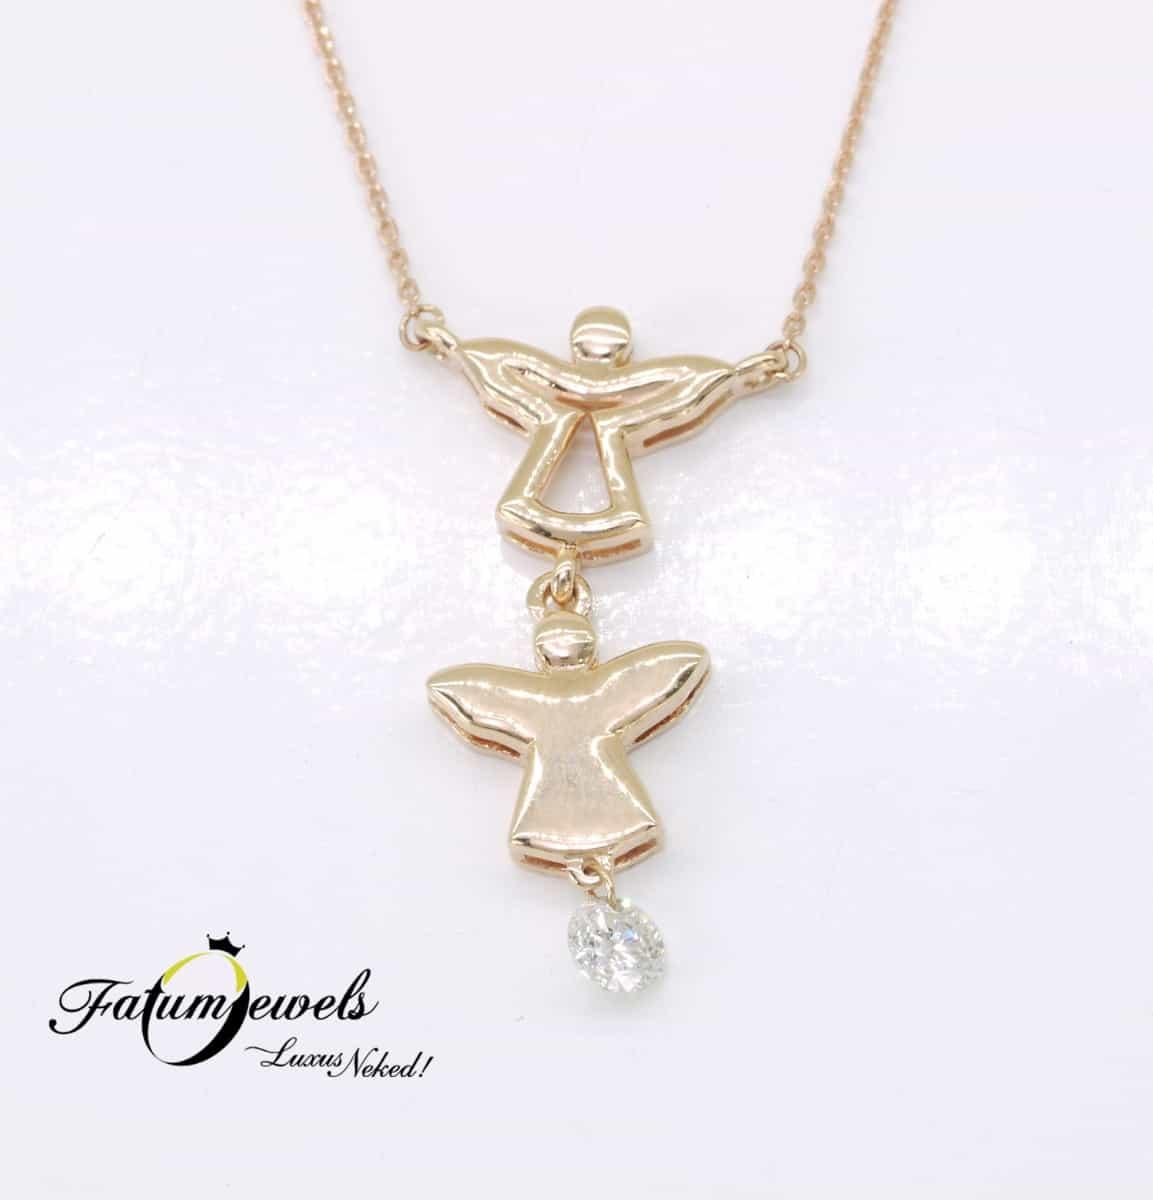 rose-arany-gyemant-medal-lanccal-angyalka-ptm06-0-11ct-h-i1-14k-1